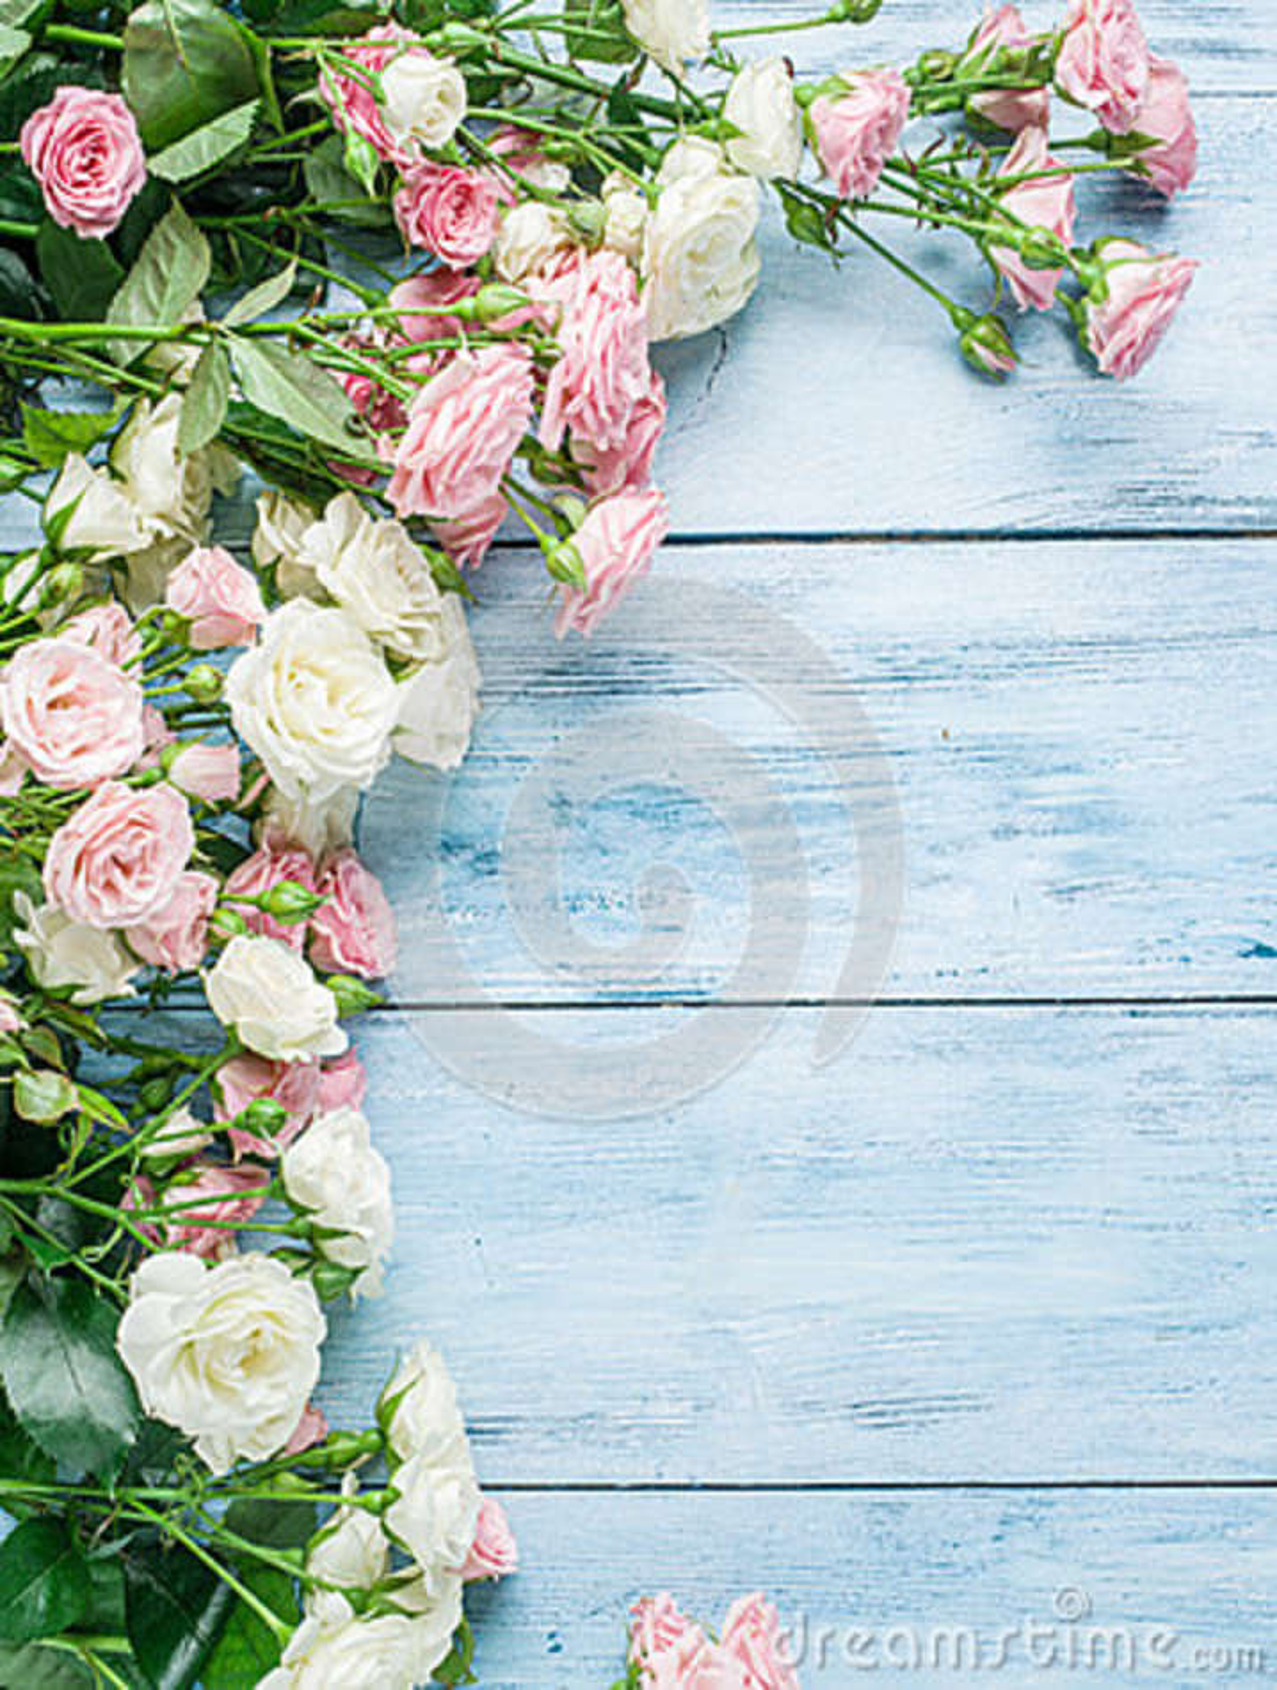 Delikata nya rosor på den blåa bakgrunden